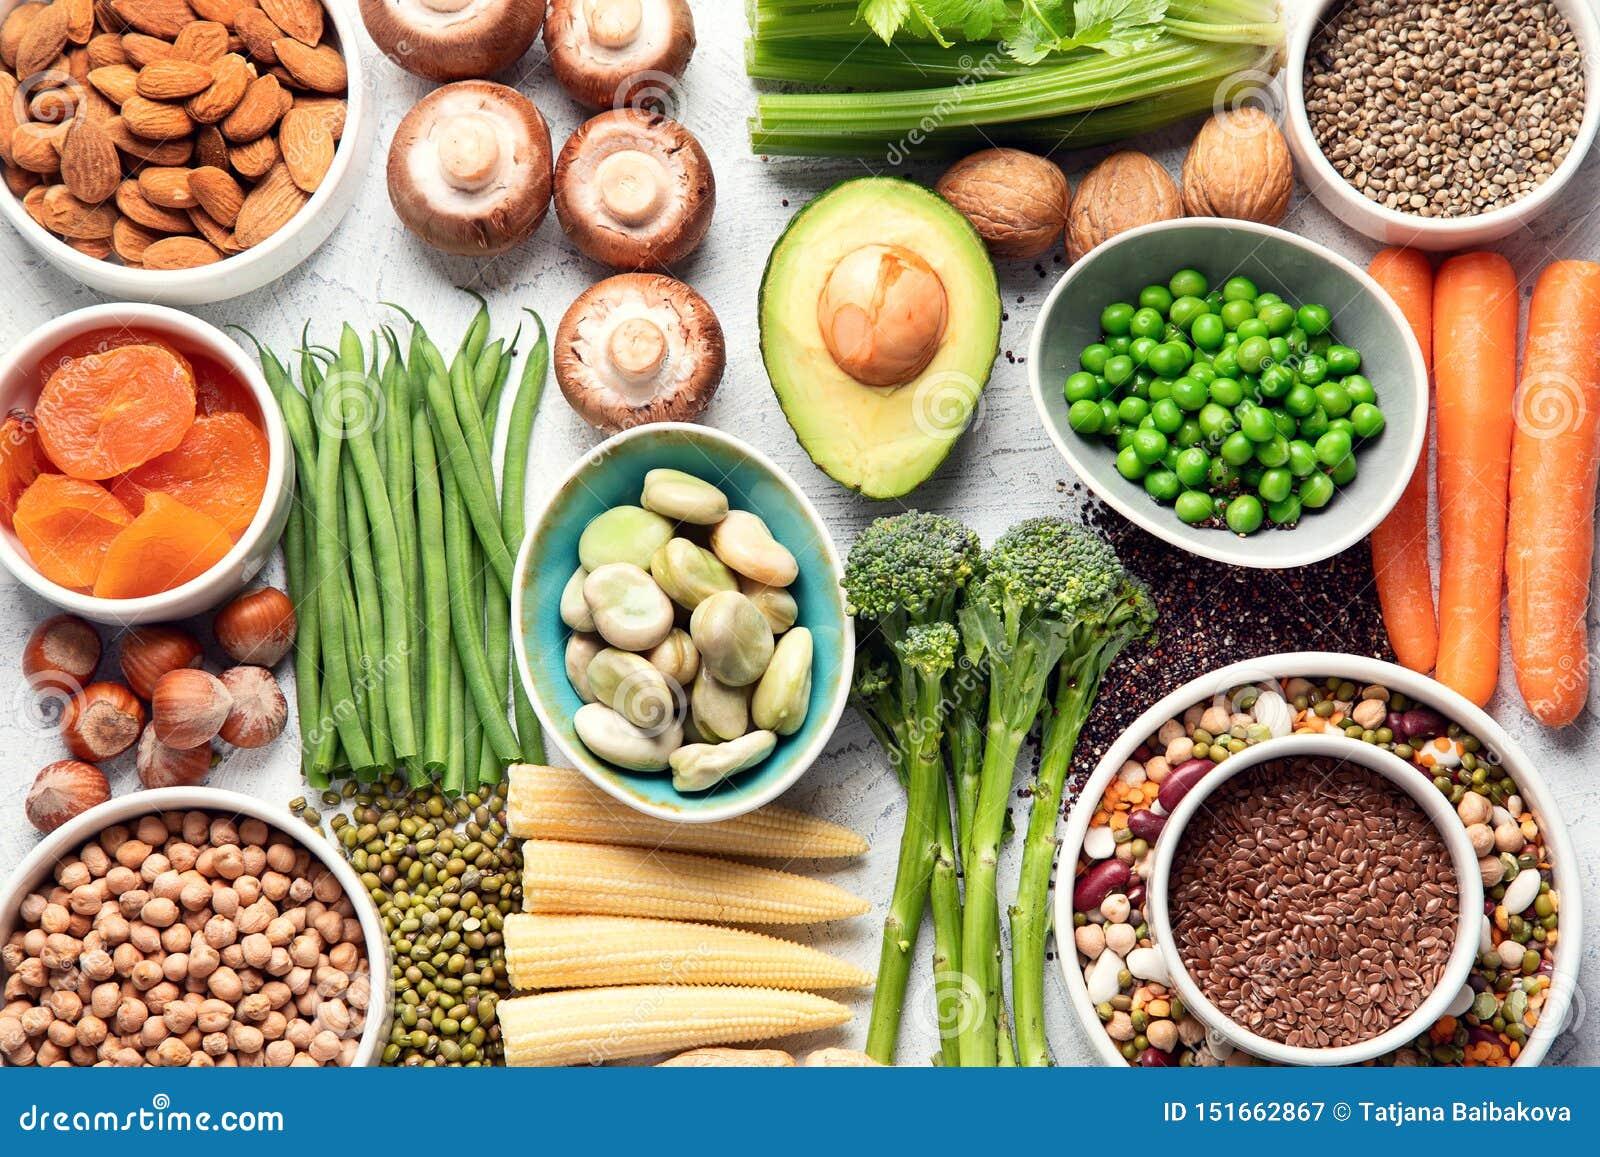 fruit nuts legumes vegetables protein diet